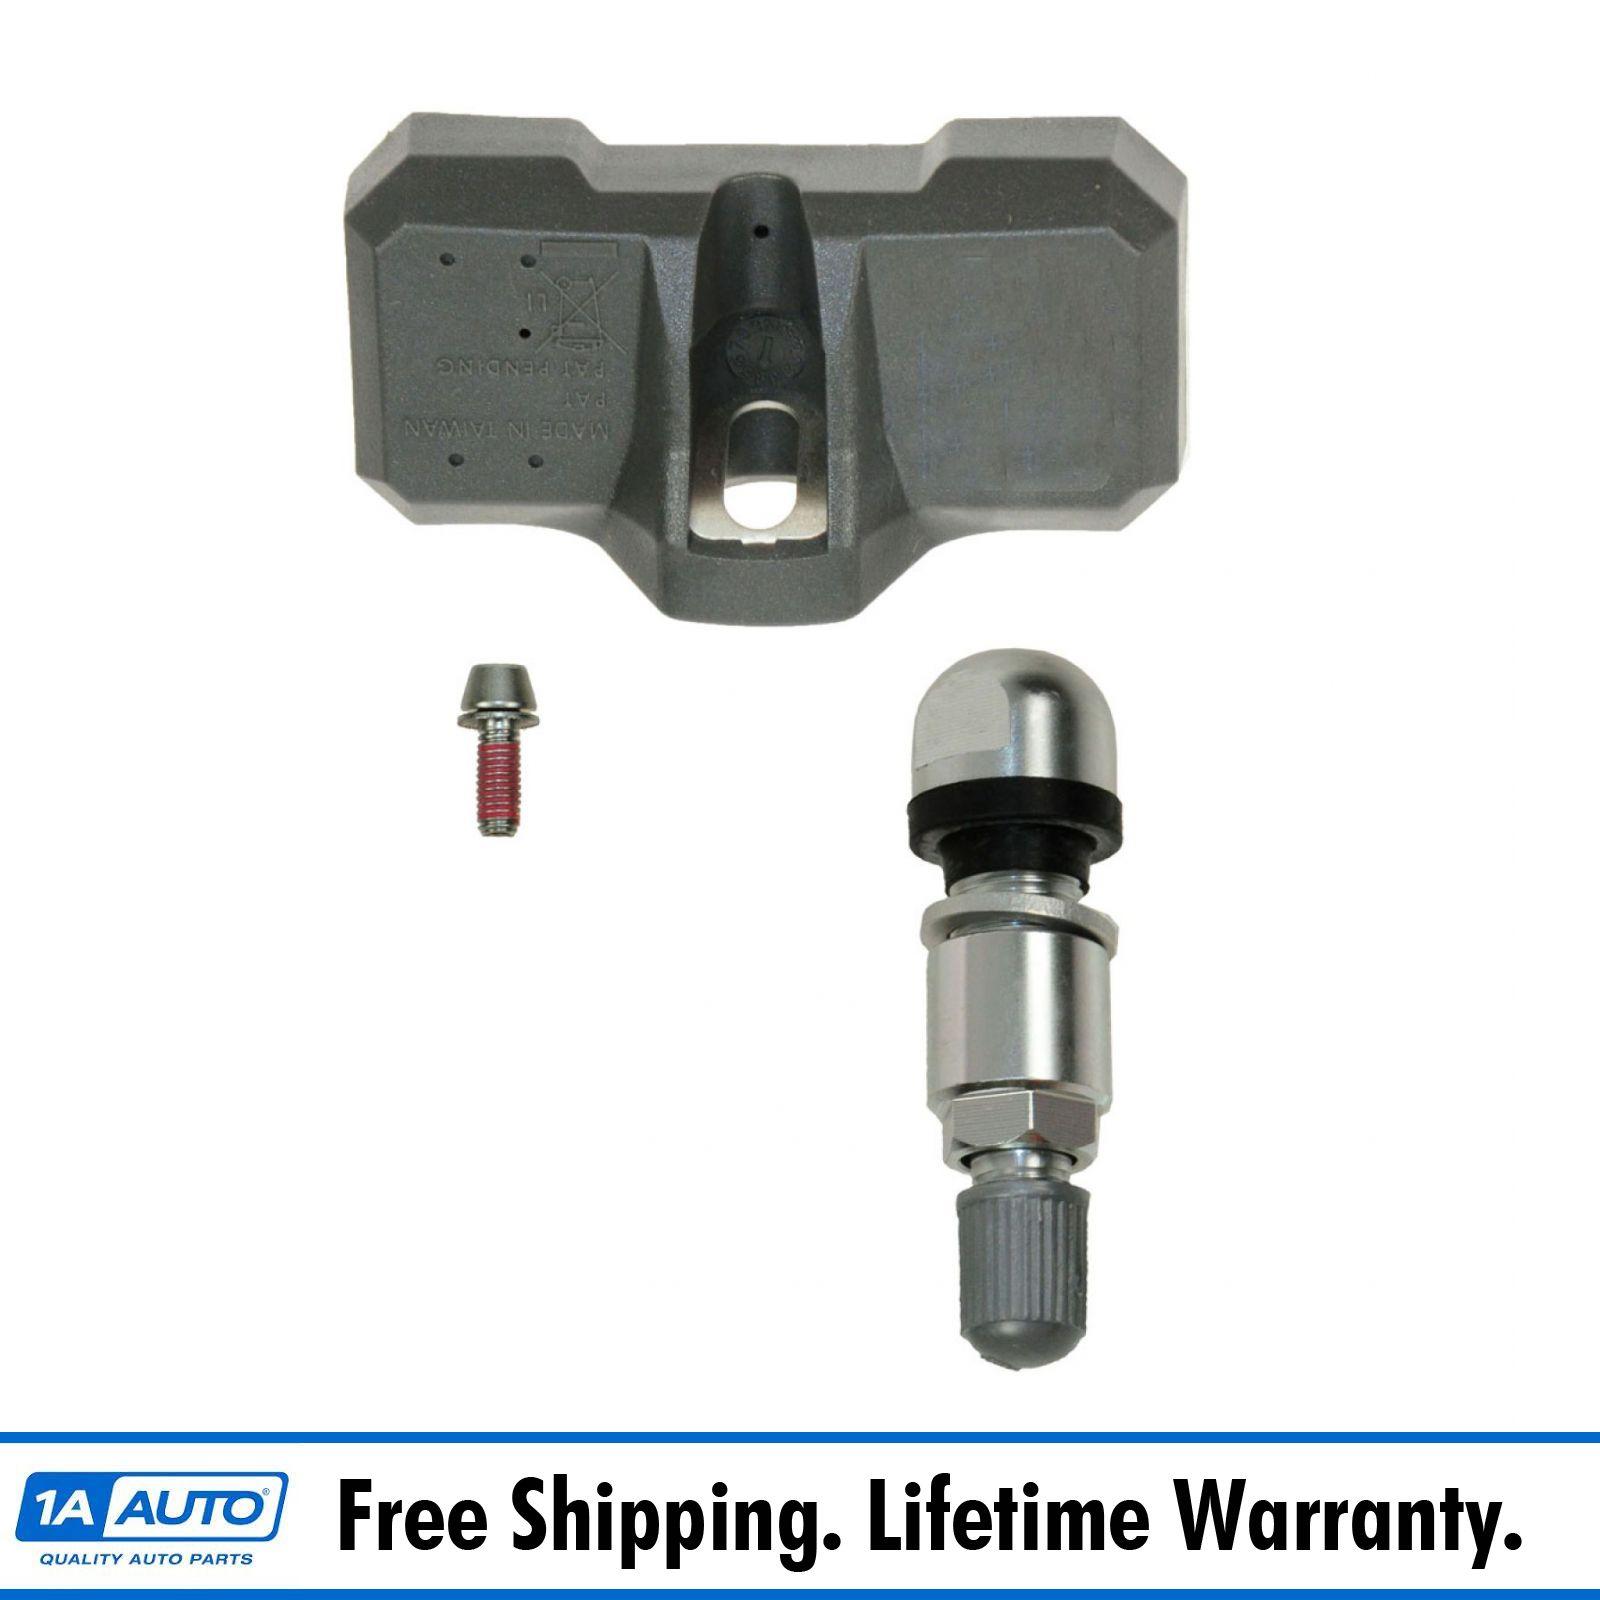 Set 4 TPMS Tire Pressure Sensors 315Mhz Metal for 2010 Chevy HHR